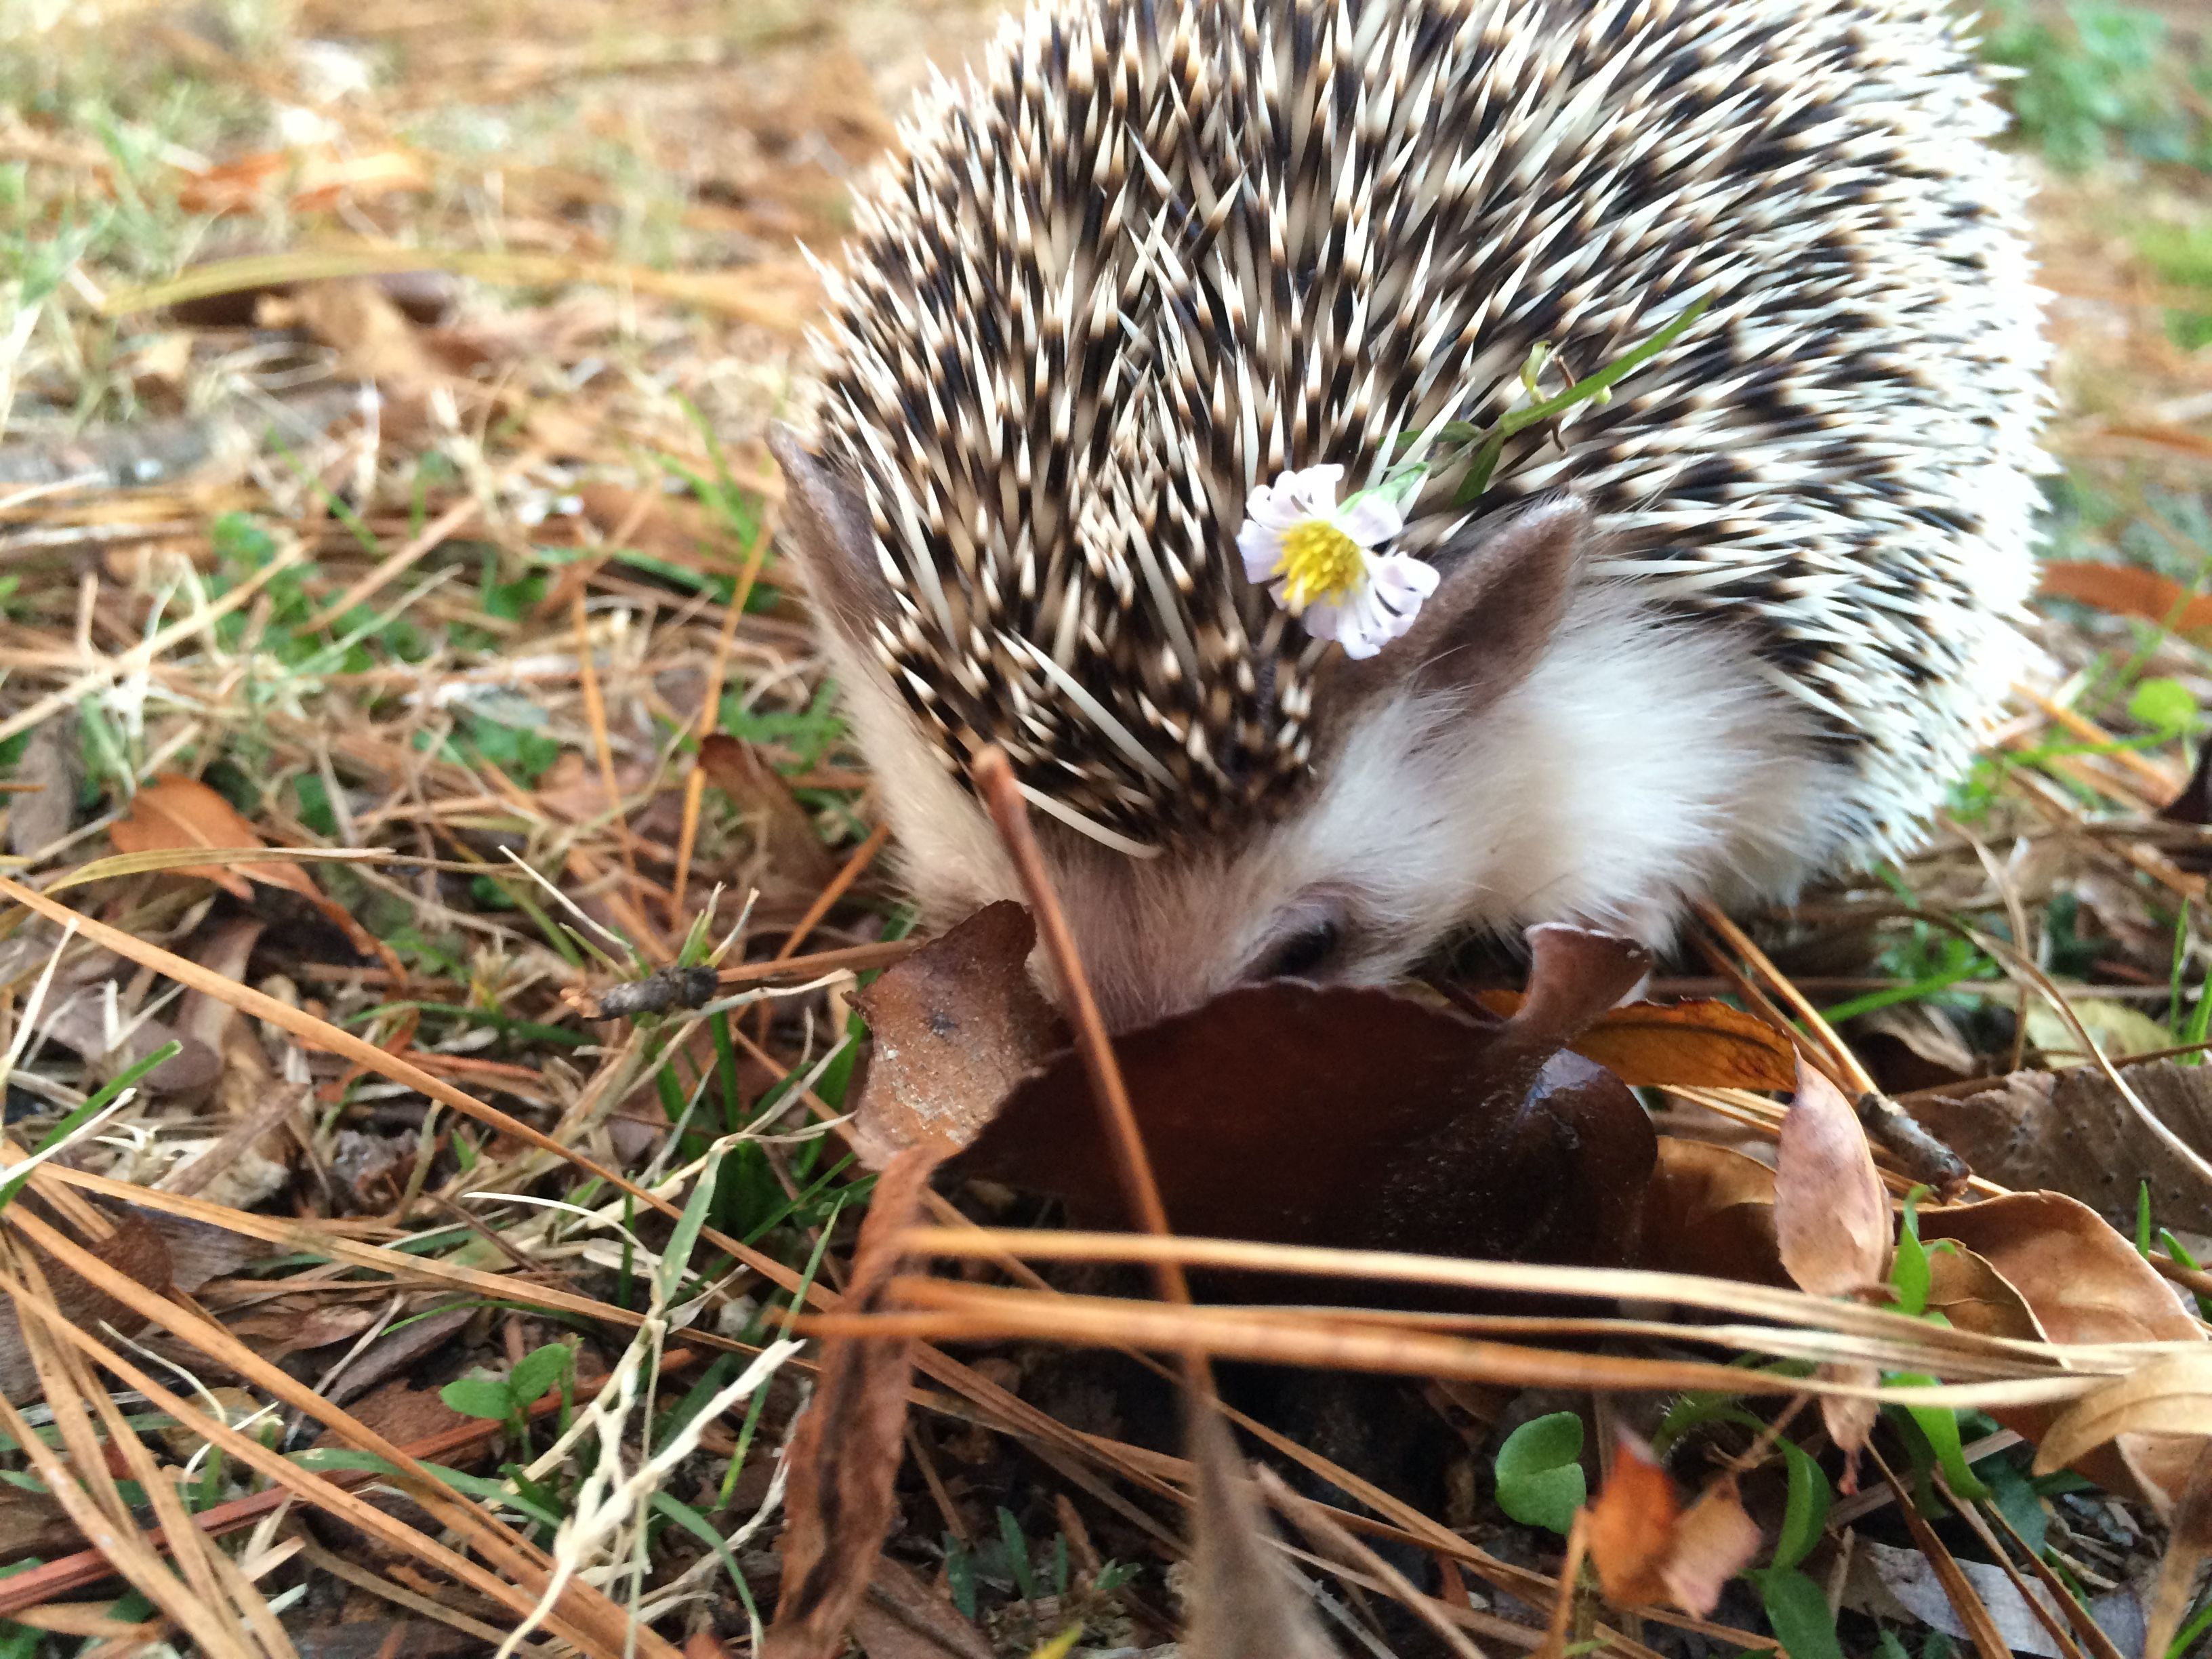 Shy hedgehog, hippie hedgehog named pumpkin